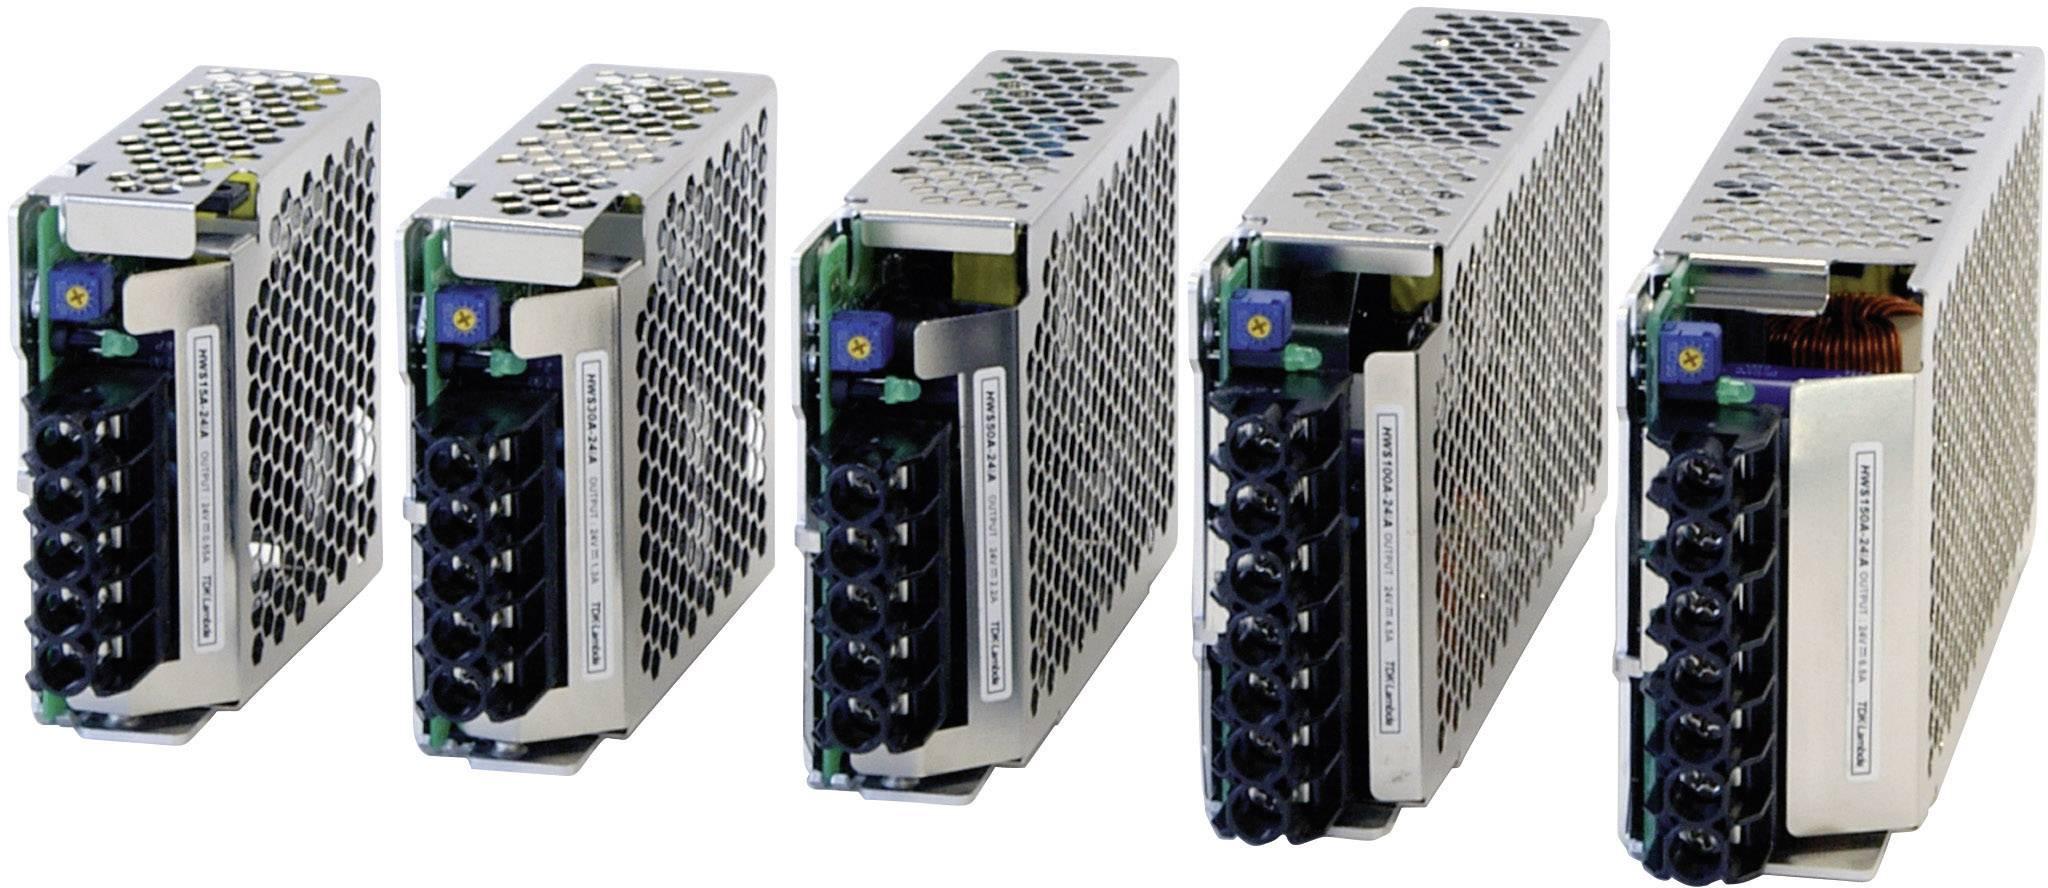 Zabudovateľný napájací zdroj TDK-Lambda HWS-100A-5/A, 5 V, 100 W